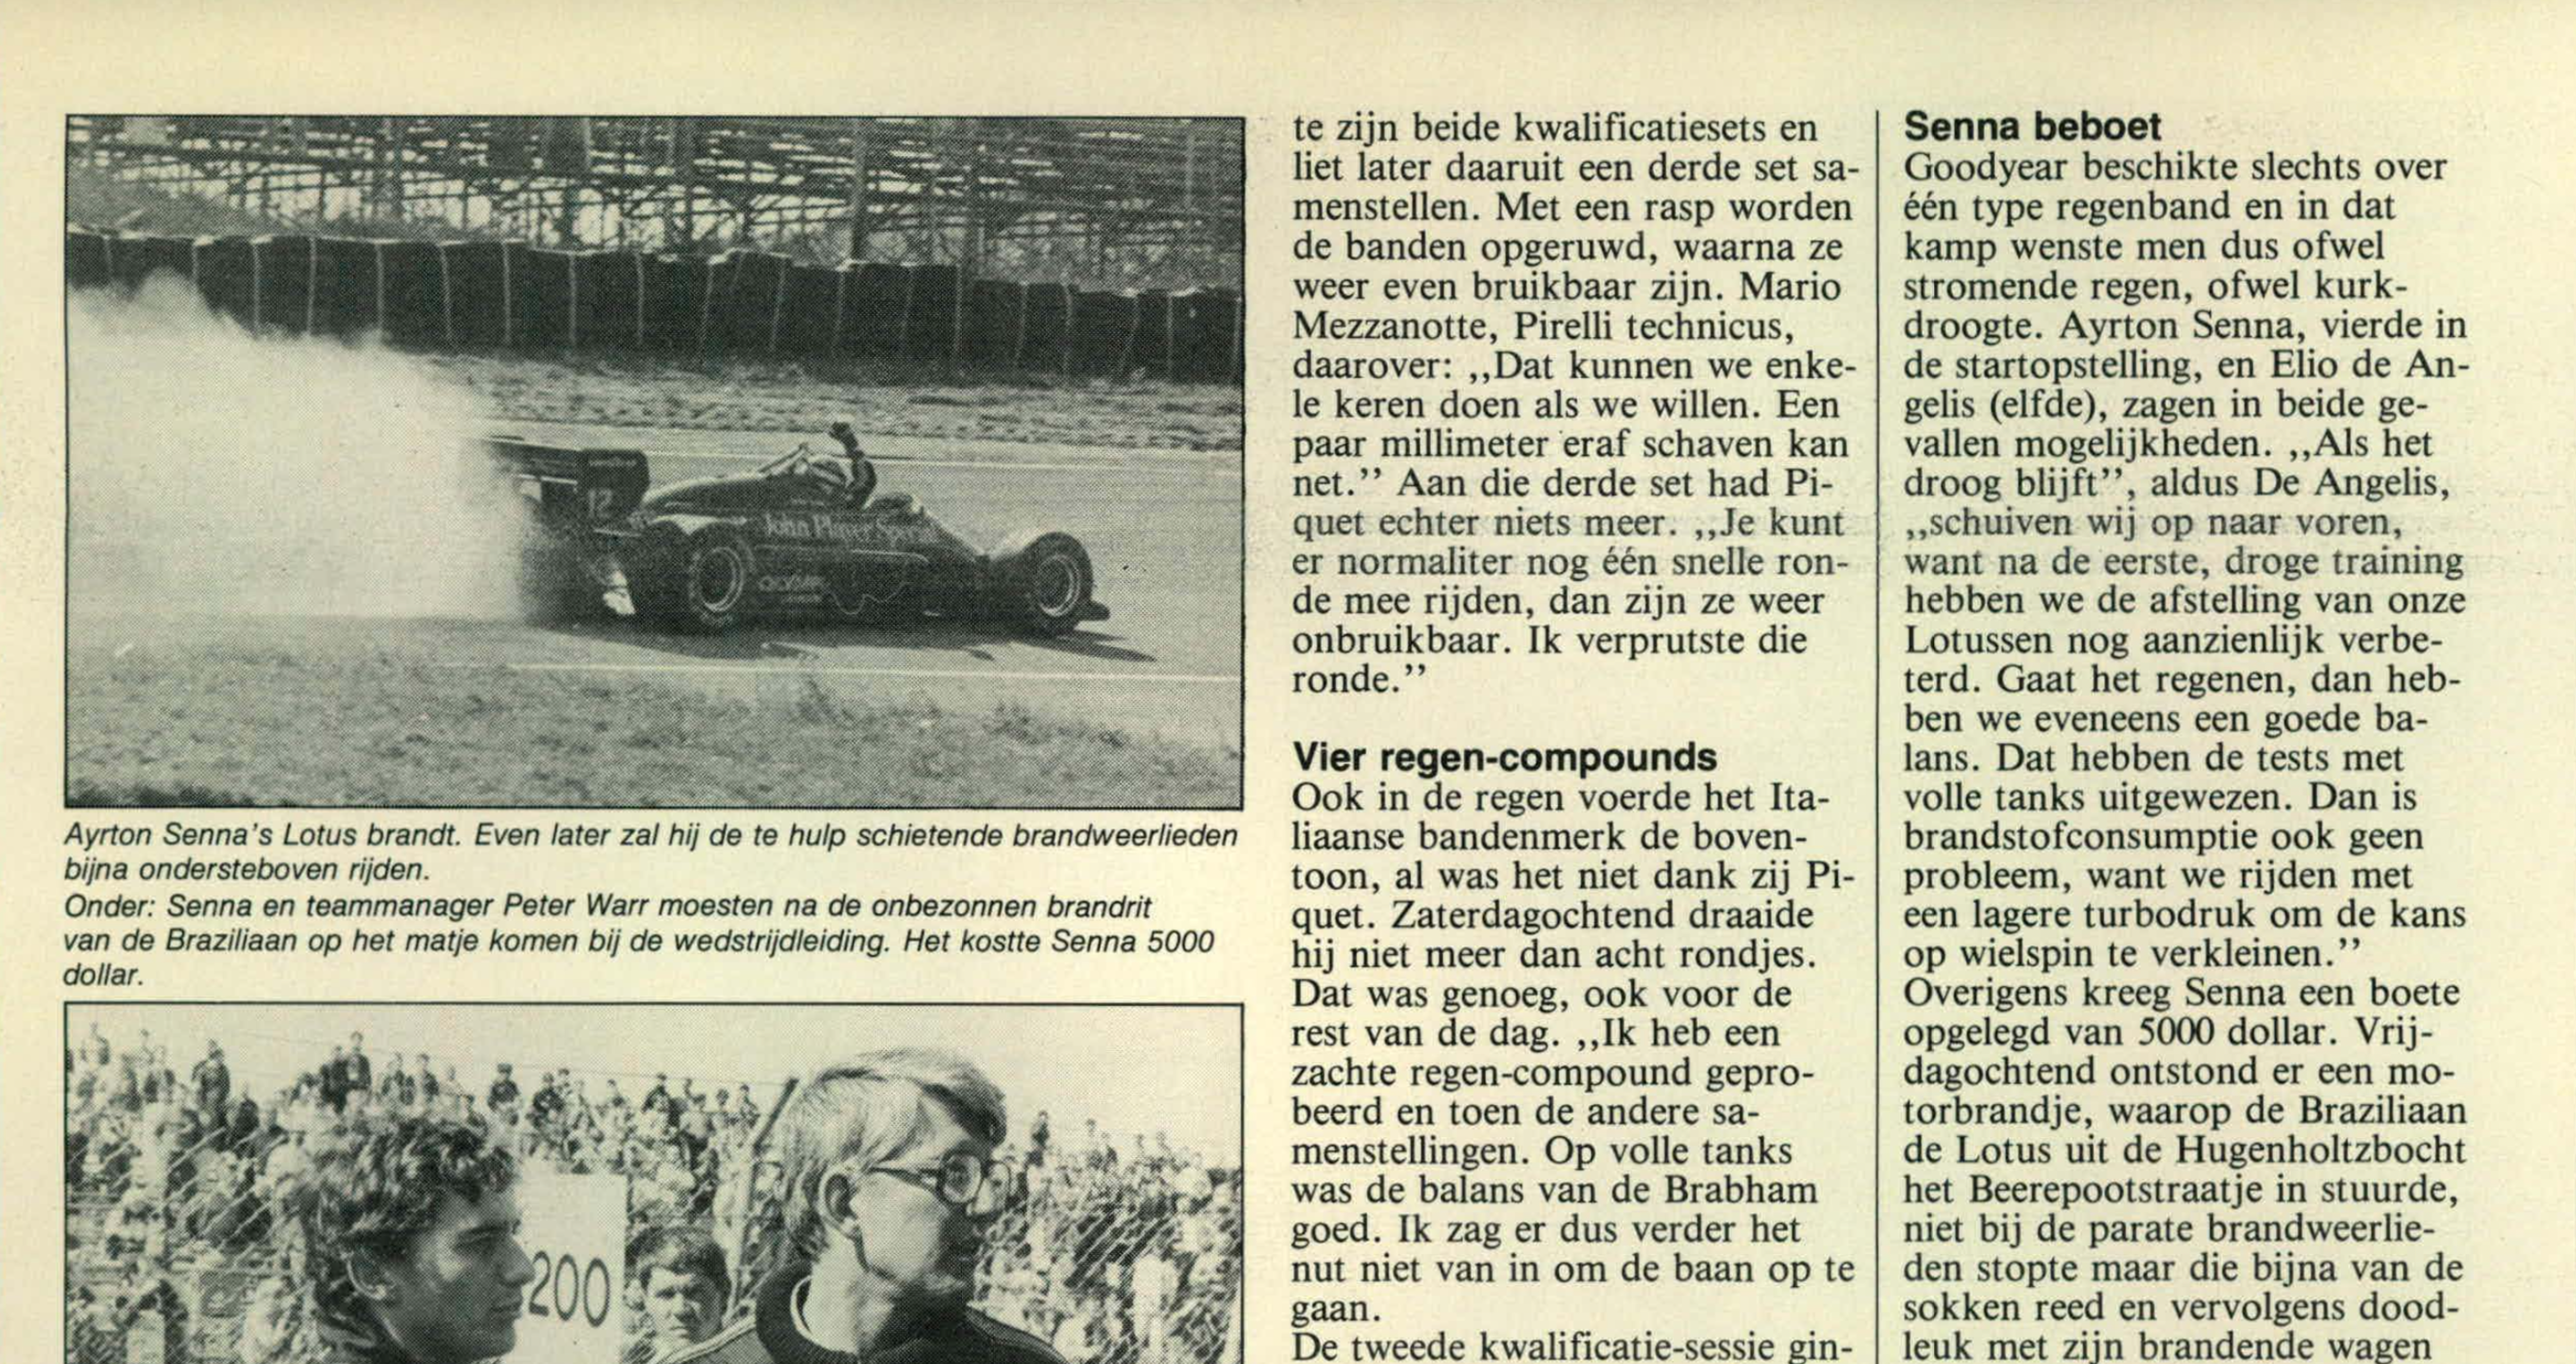 Senna in brand - Zandvoort 1985